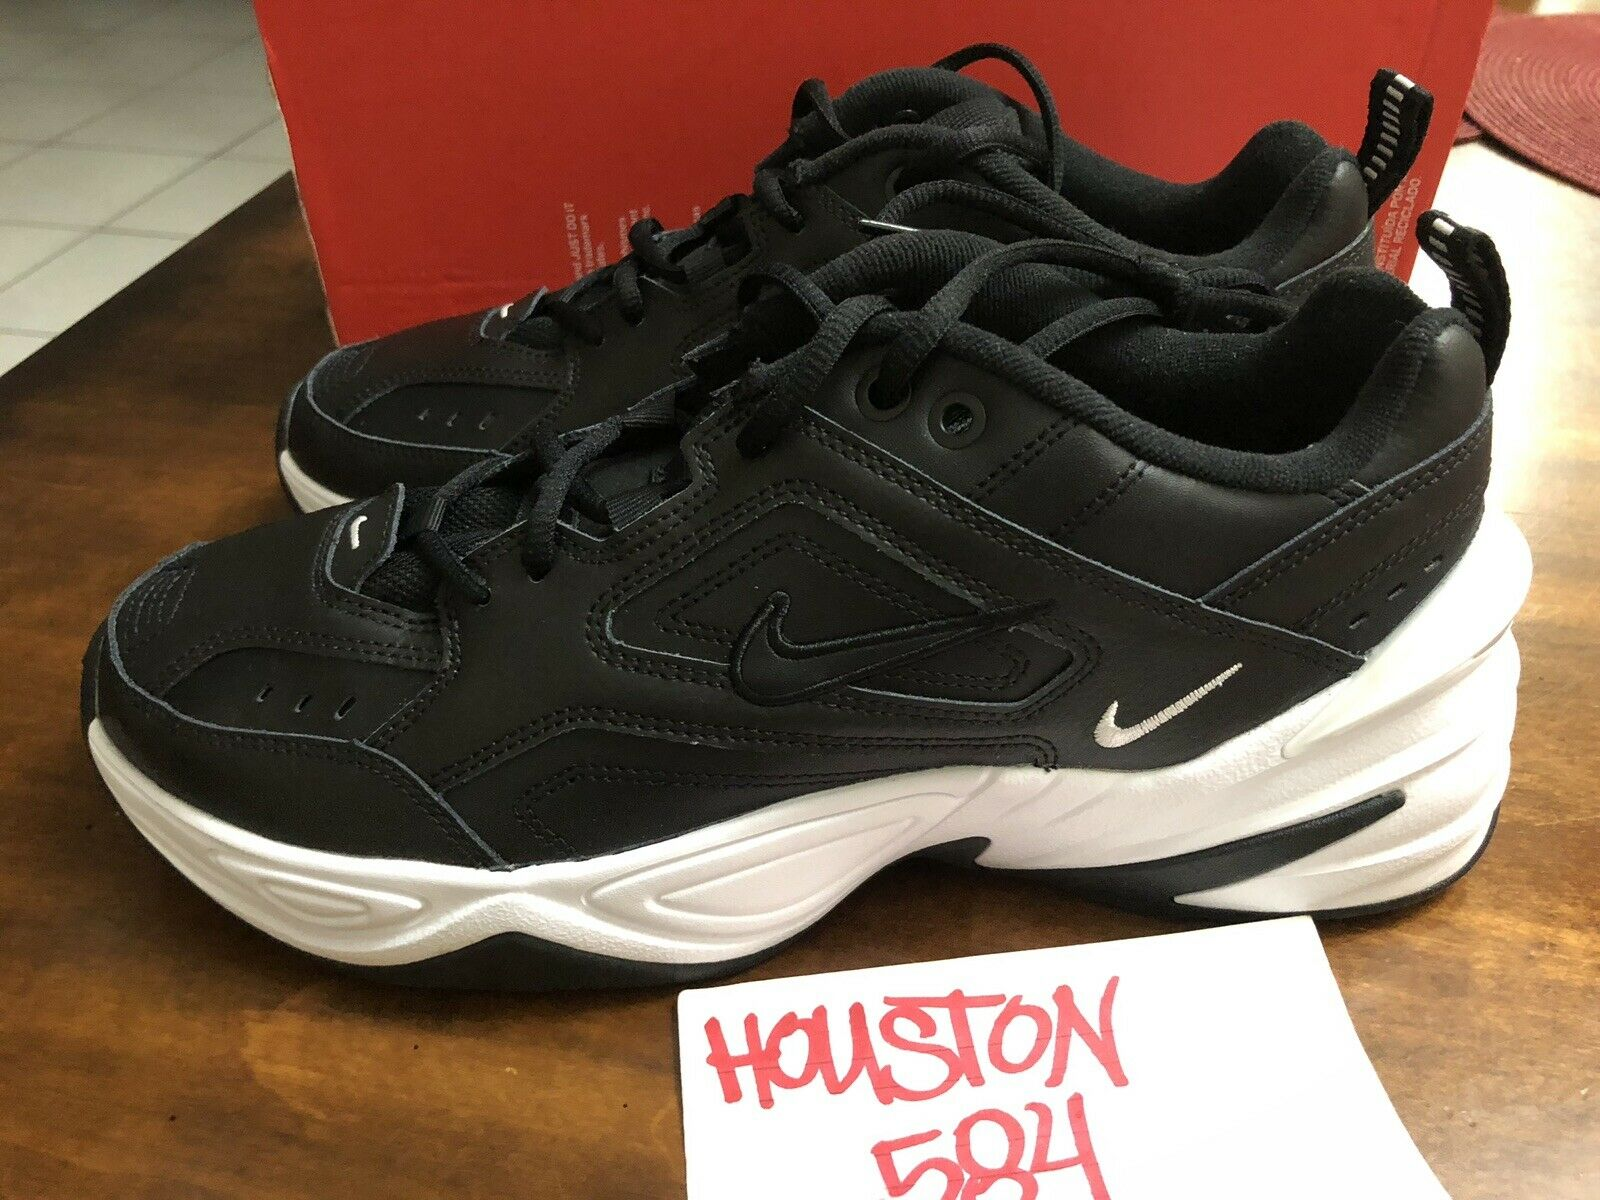 WOMEN'S NIKE M2K TEKNO Sz10.5 BLACK WHITE AO3108-005 PLATFORM Dad shoes CLASSIC